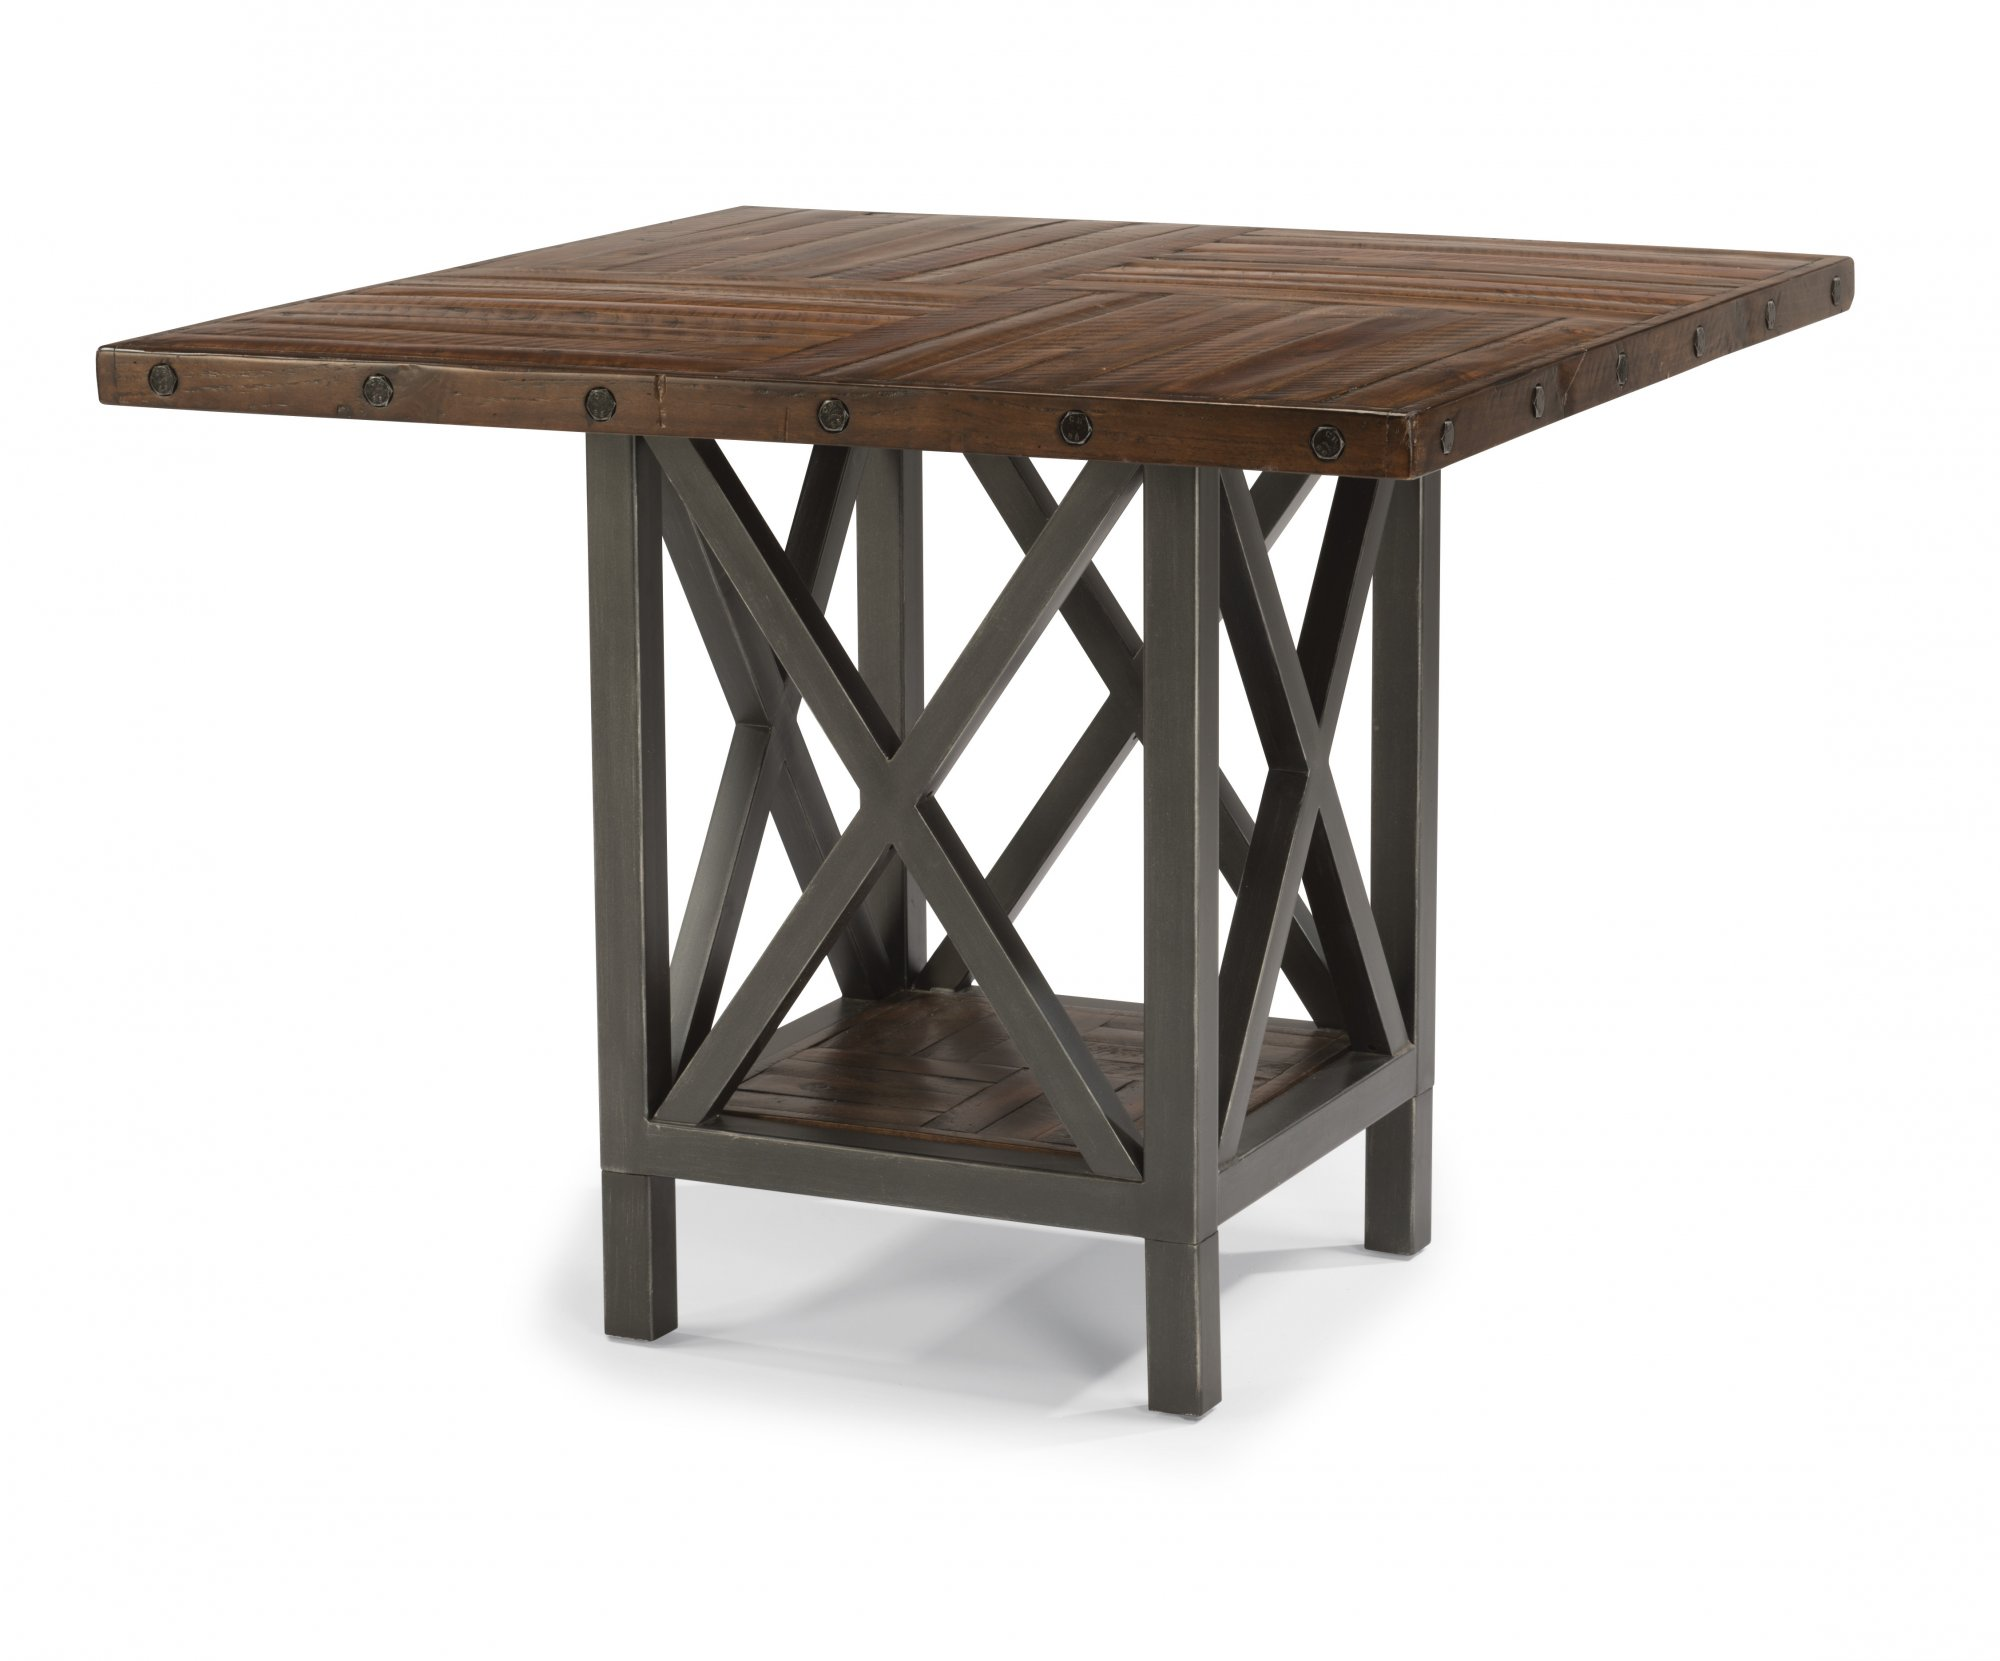 Carpenter flexsteel share via email download a high resolution image geotapseo Images